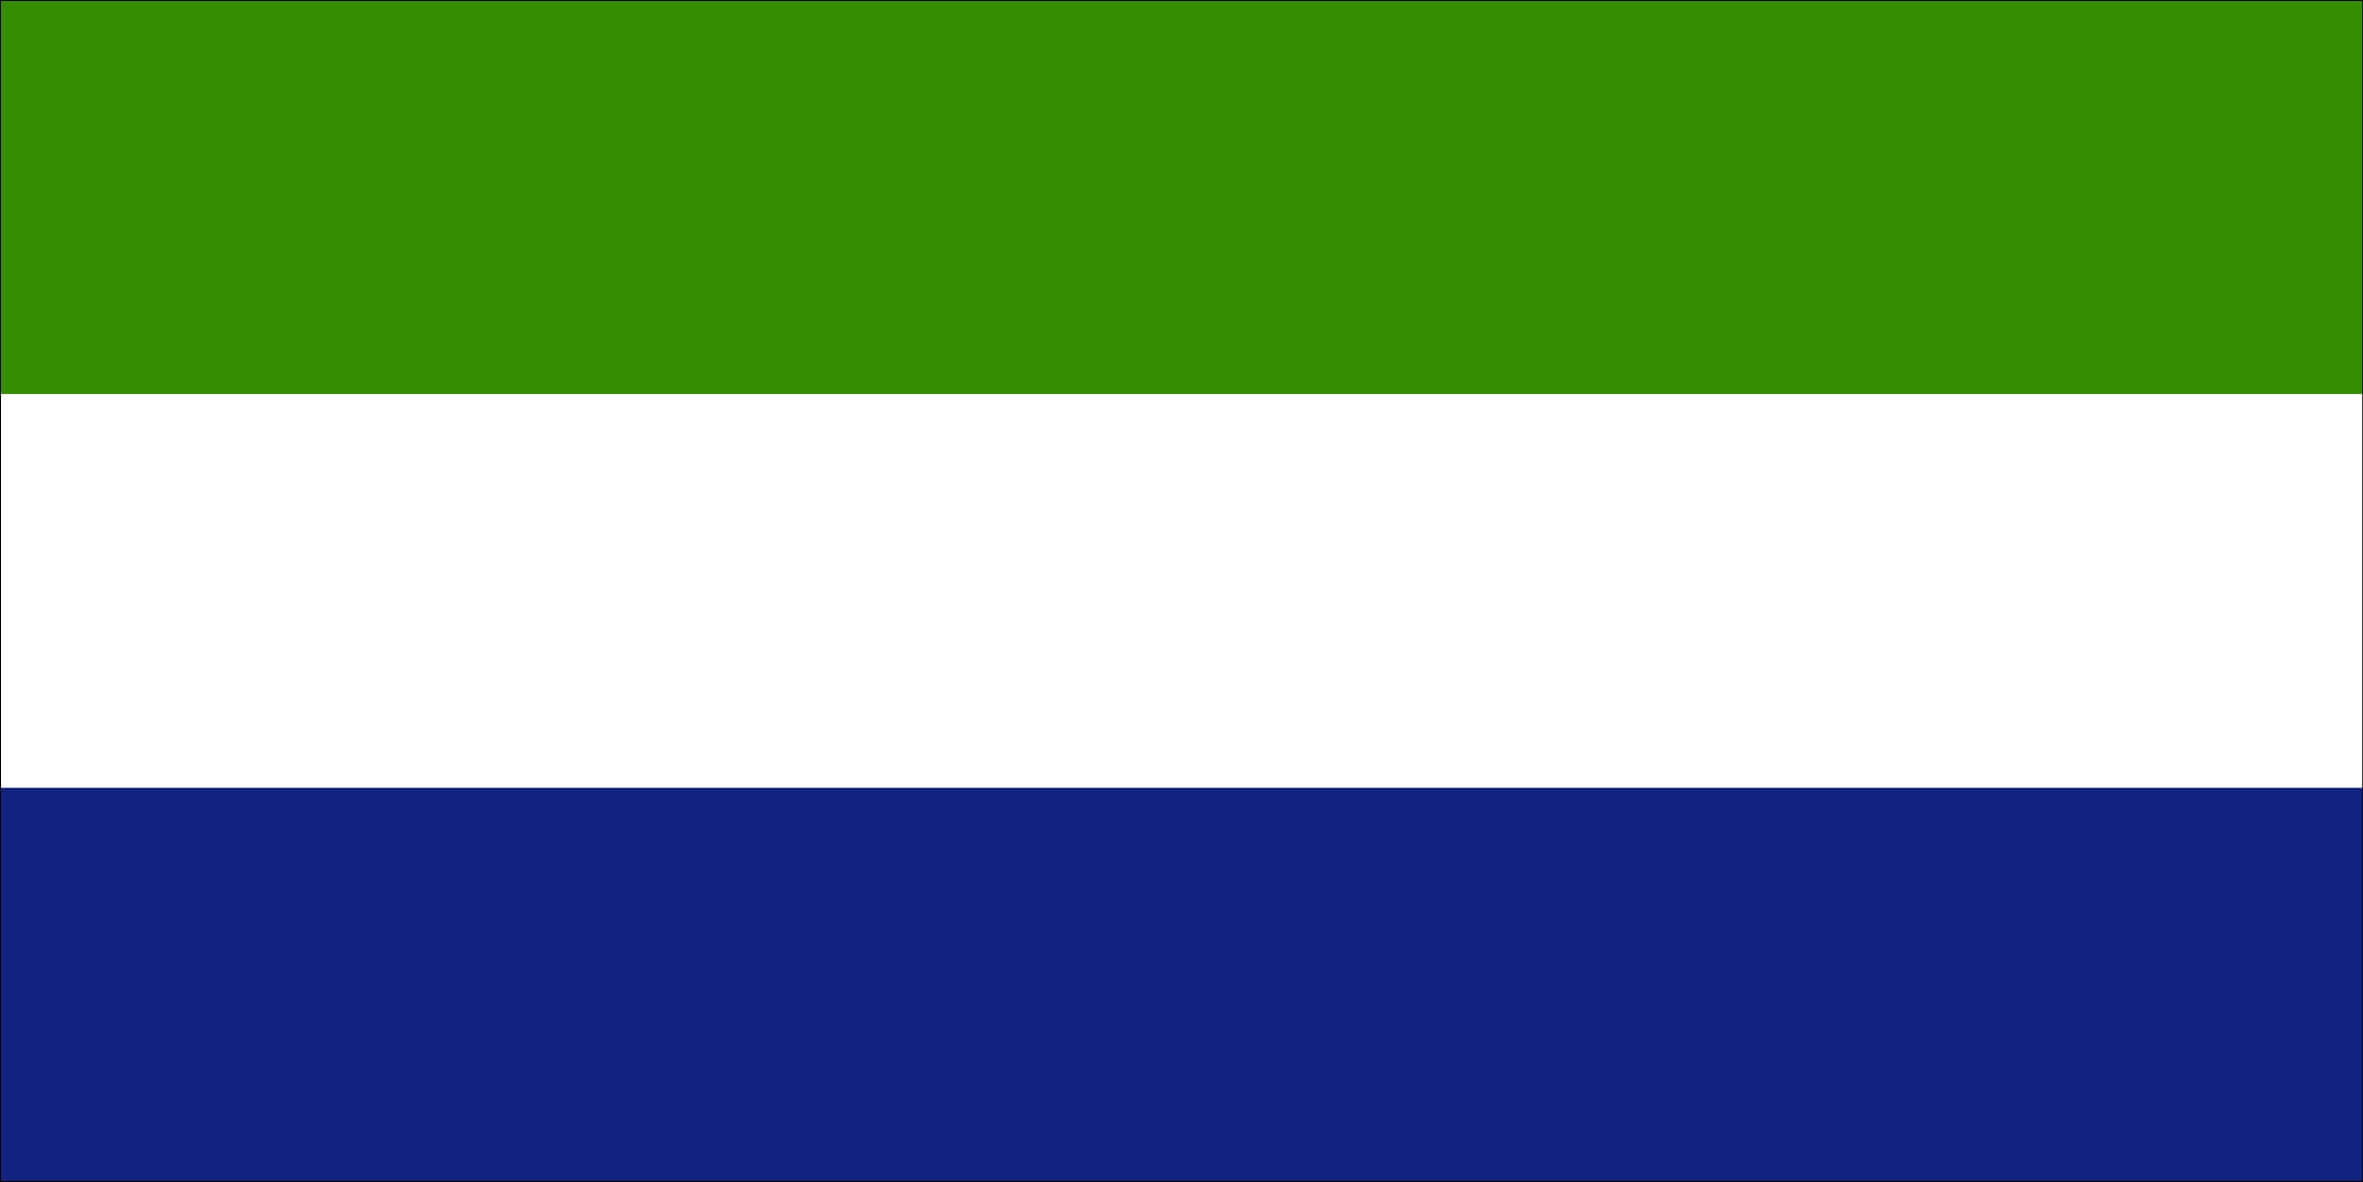 Bandera Islas Galapagos (EC)